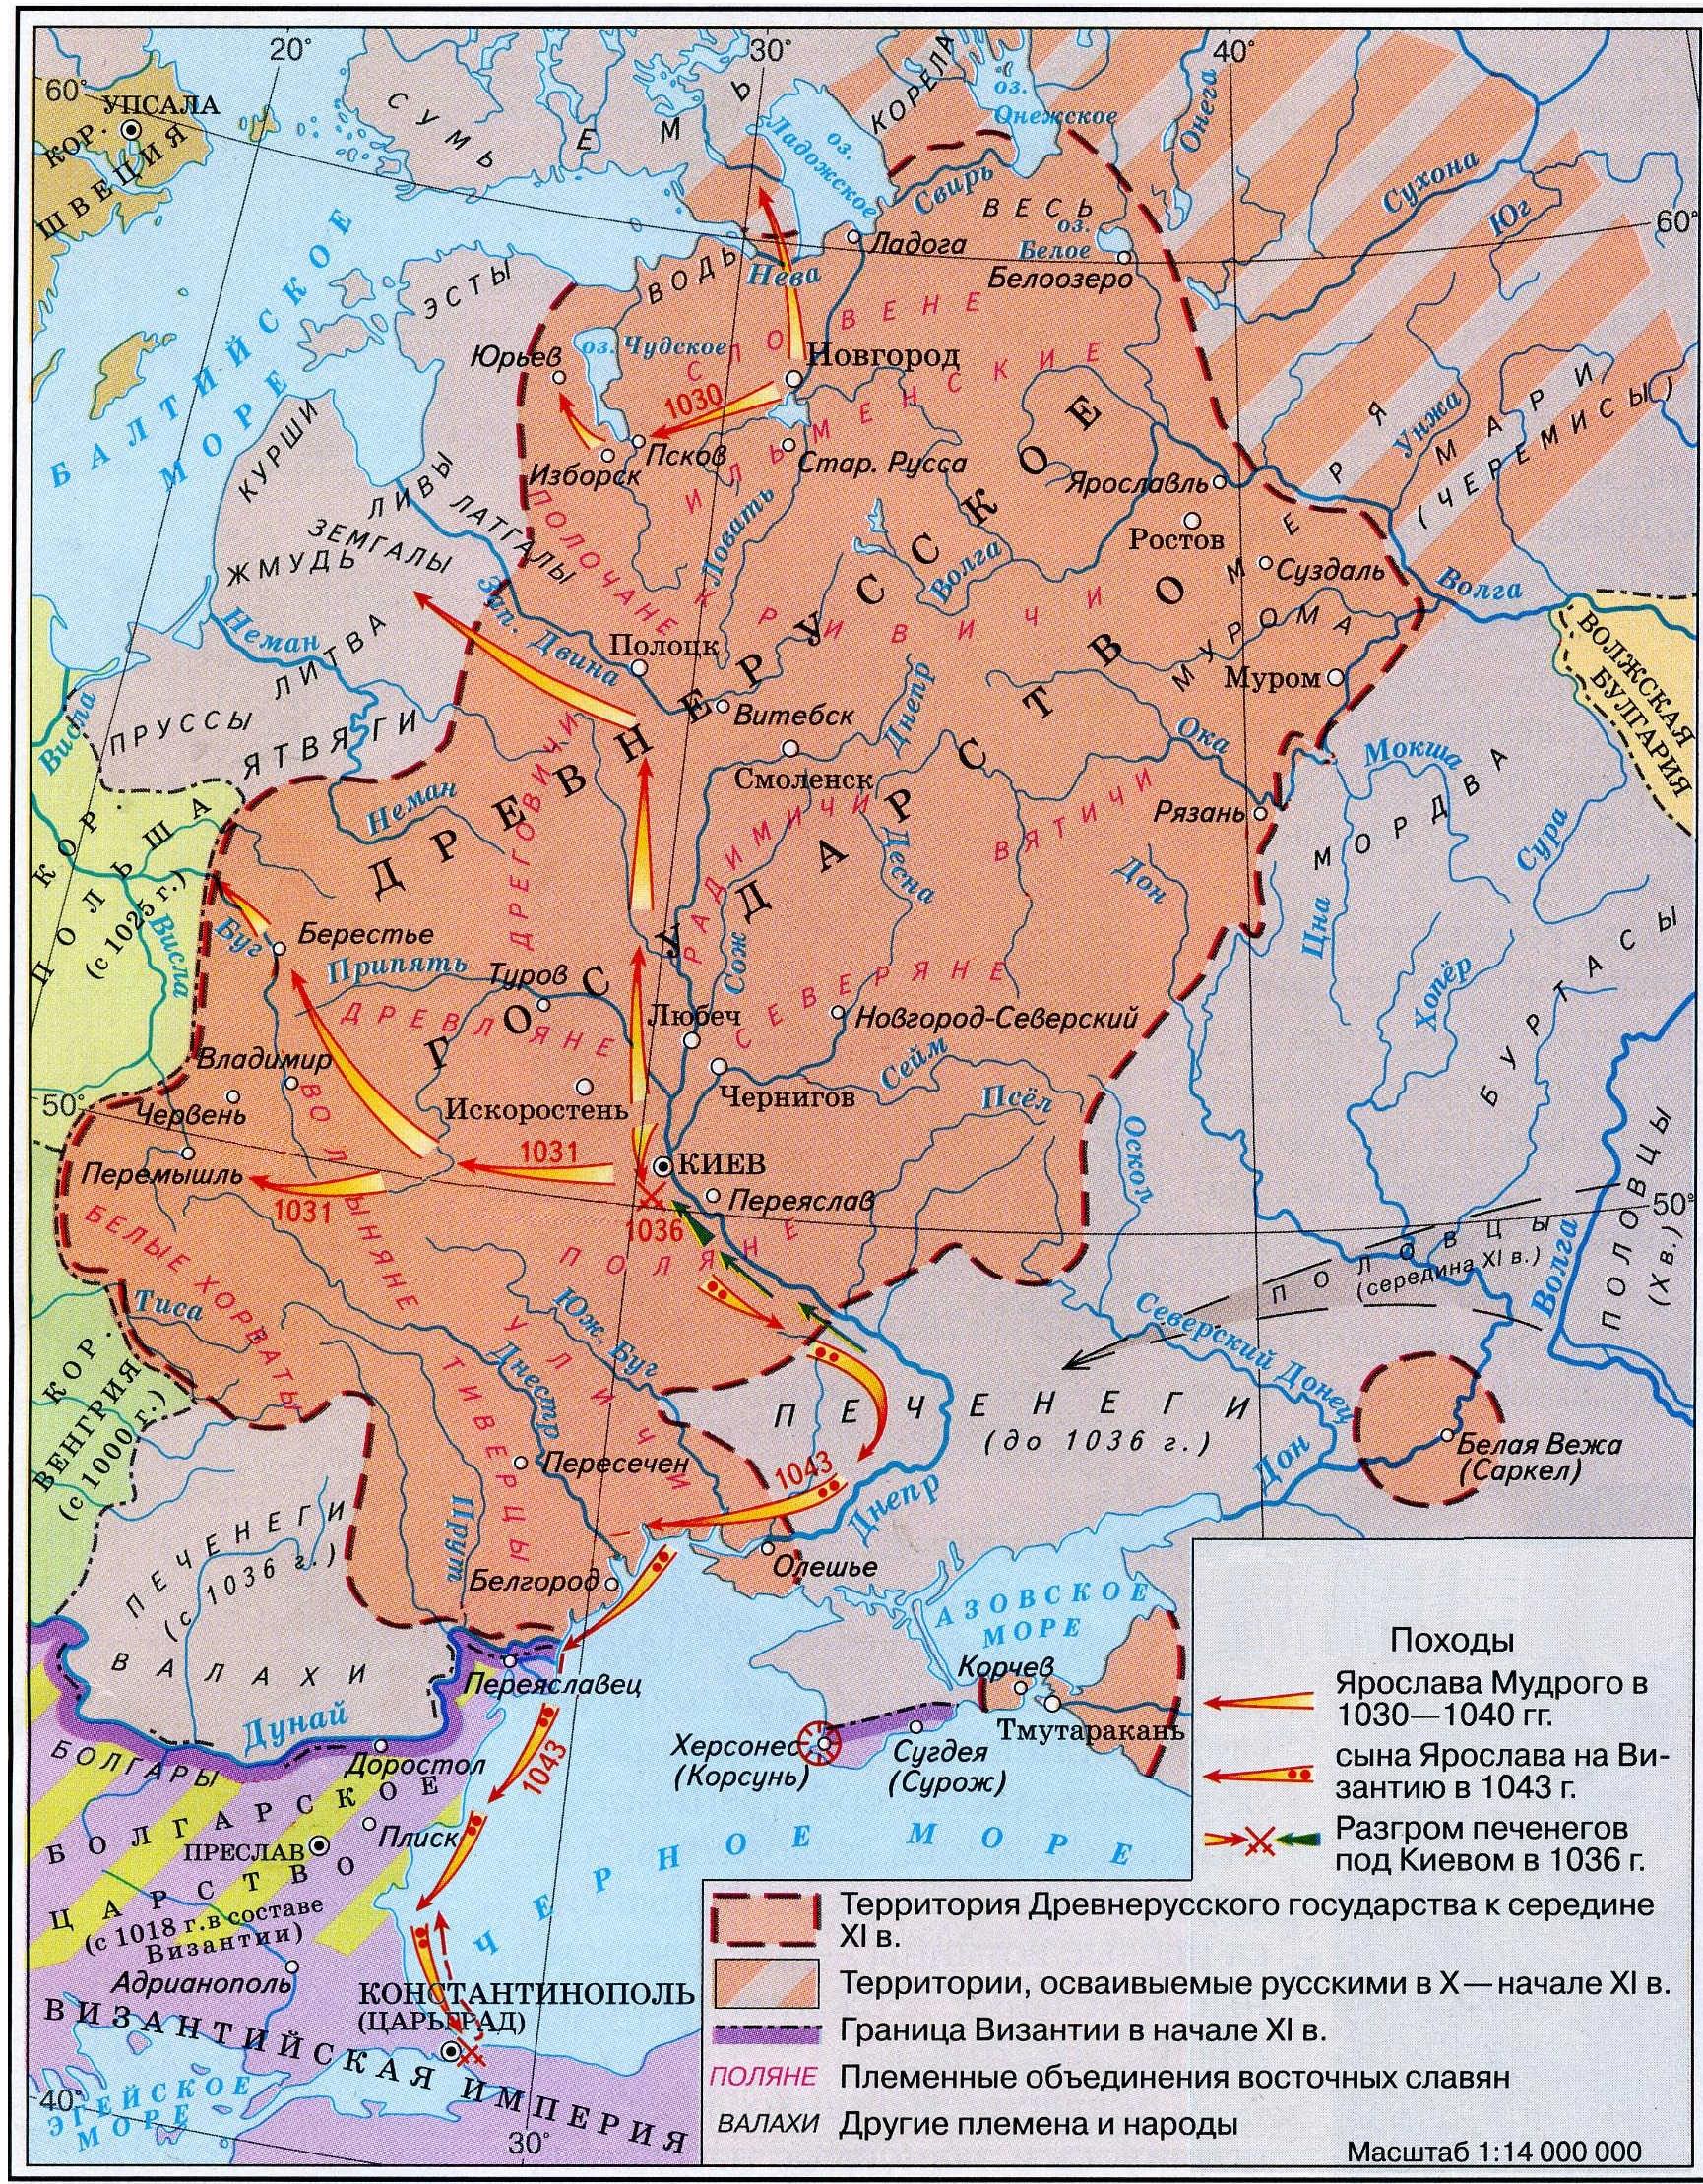 Походы Ярослава Мудрого карта